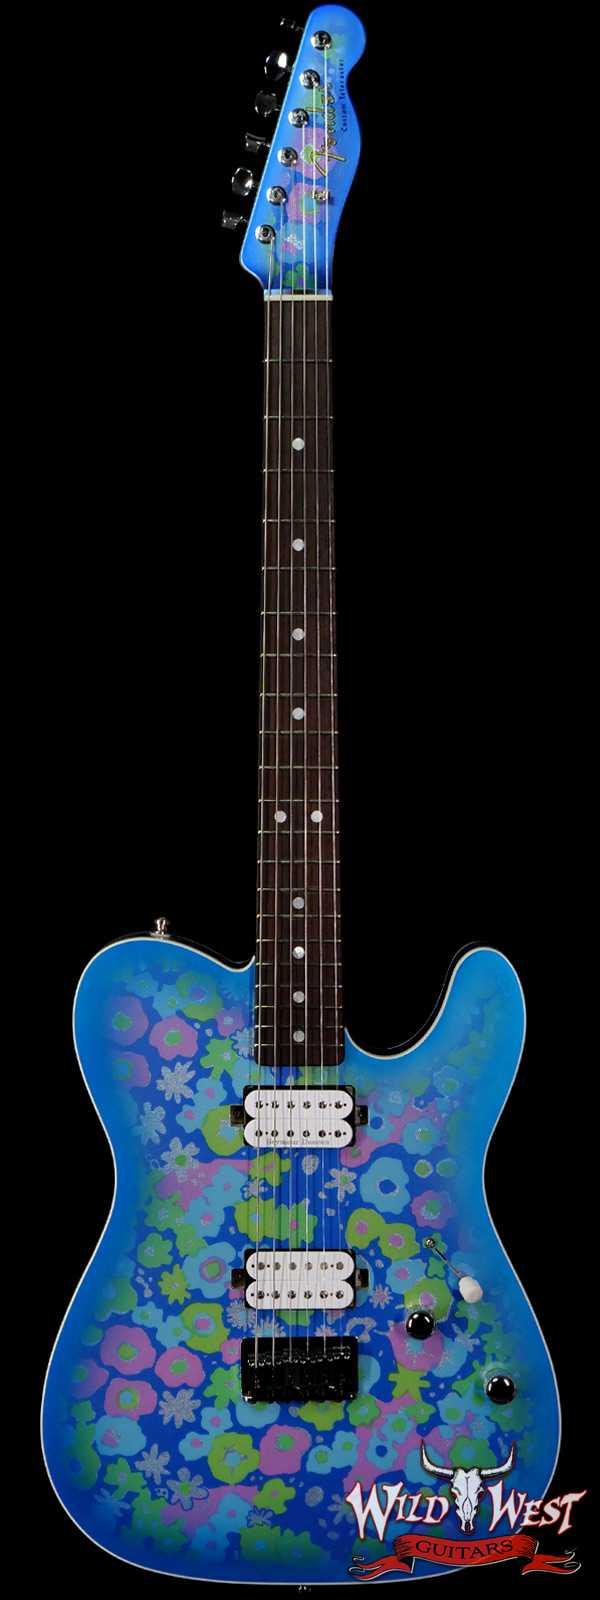 Fender Custom Shop Carlos Lopez Masterbuilt 1967 Ash Telecaster Custom HH Roasted Maple Neck NOS Blue Flower